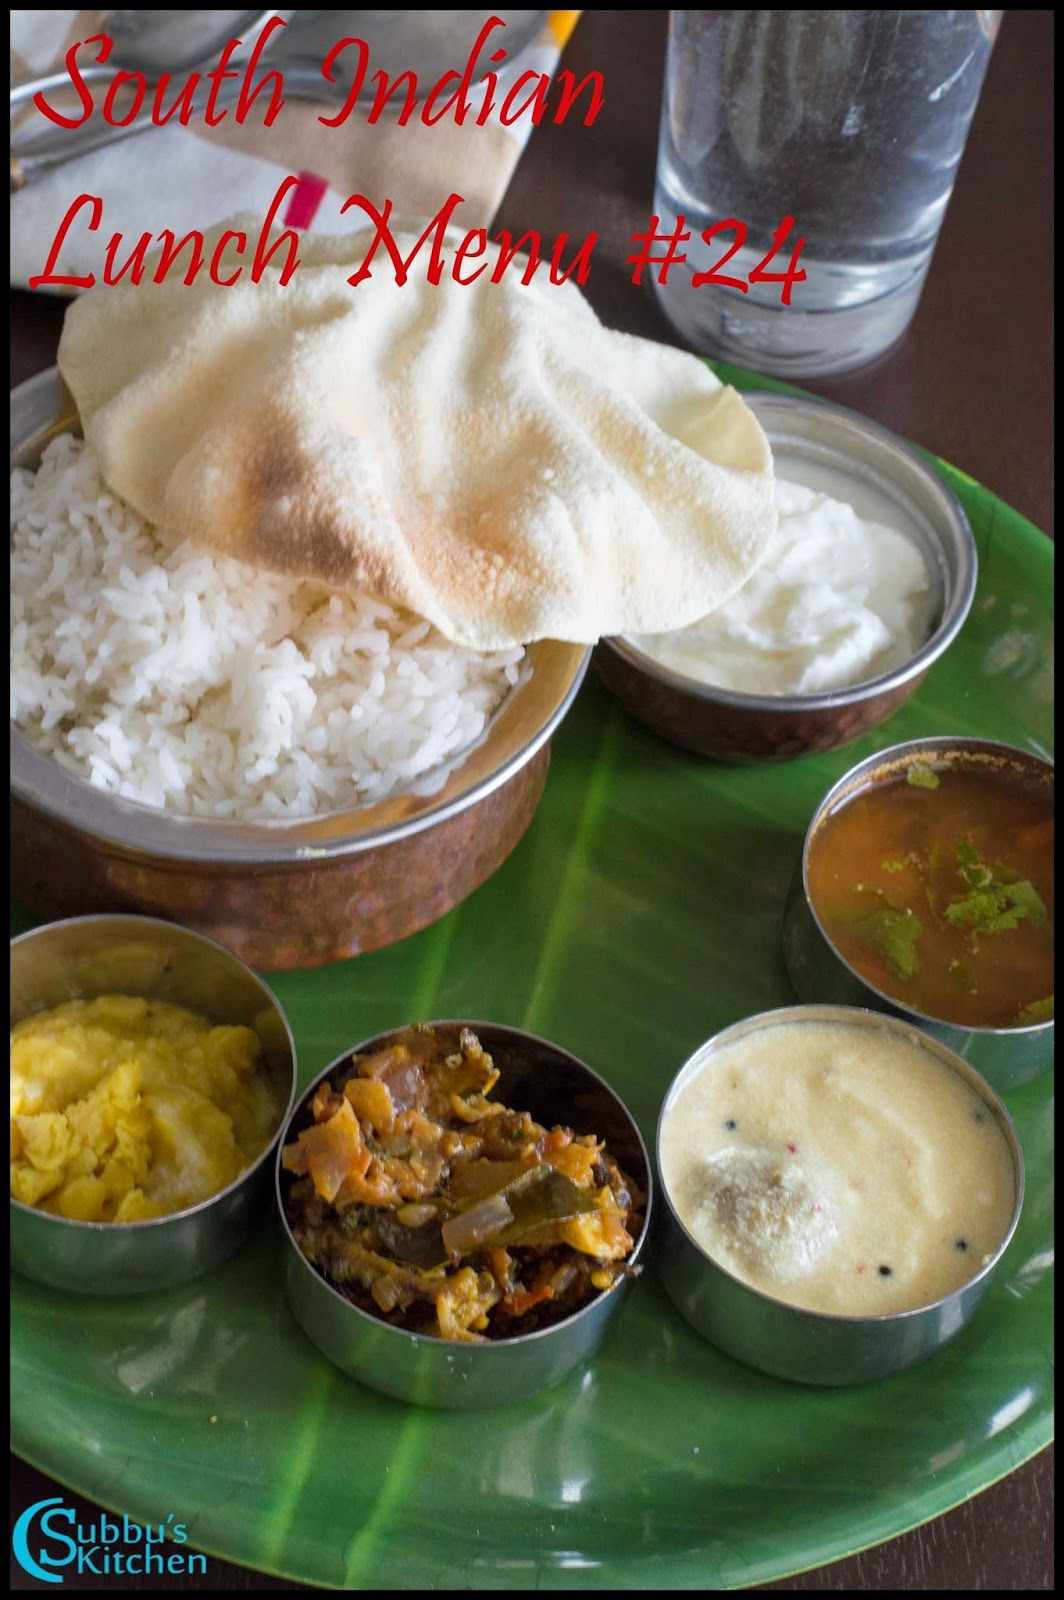 Subbus Kitchen South Indian Lunch Menu 24 Paruppu Urundai Mor Kuzhambu Kalyana Rasam Bittergourd Stir Fry Lunch Menu Indian Food Recipes Vegetarian Lunch